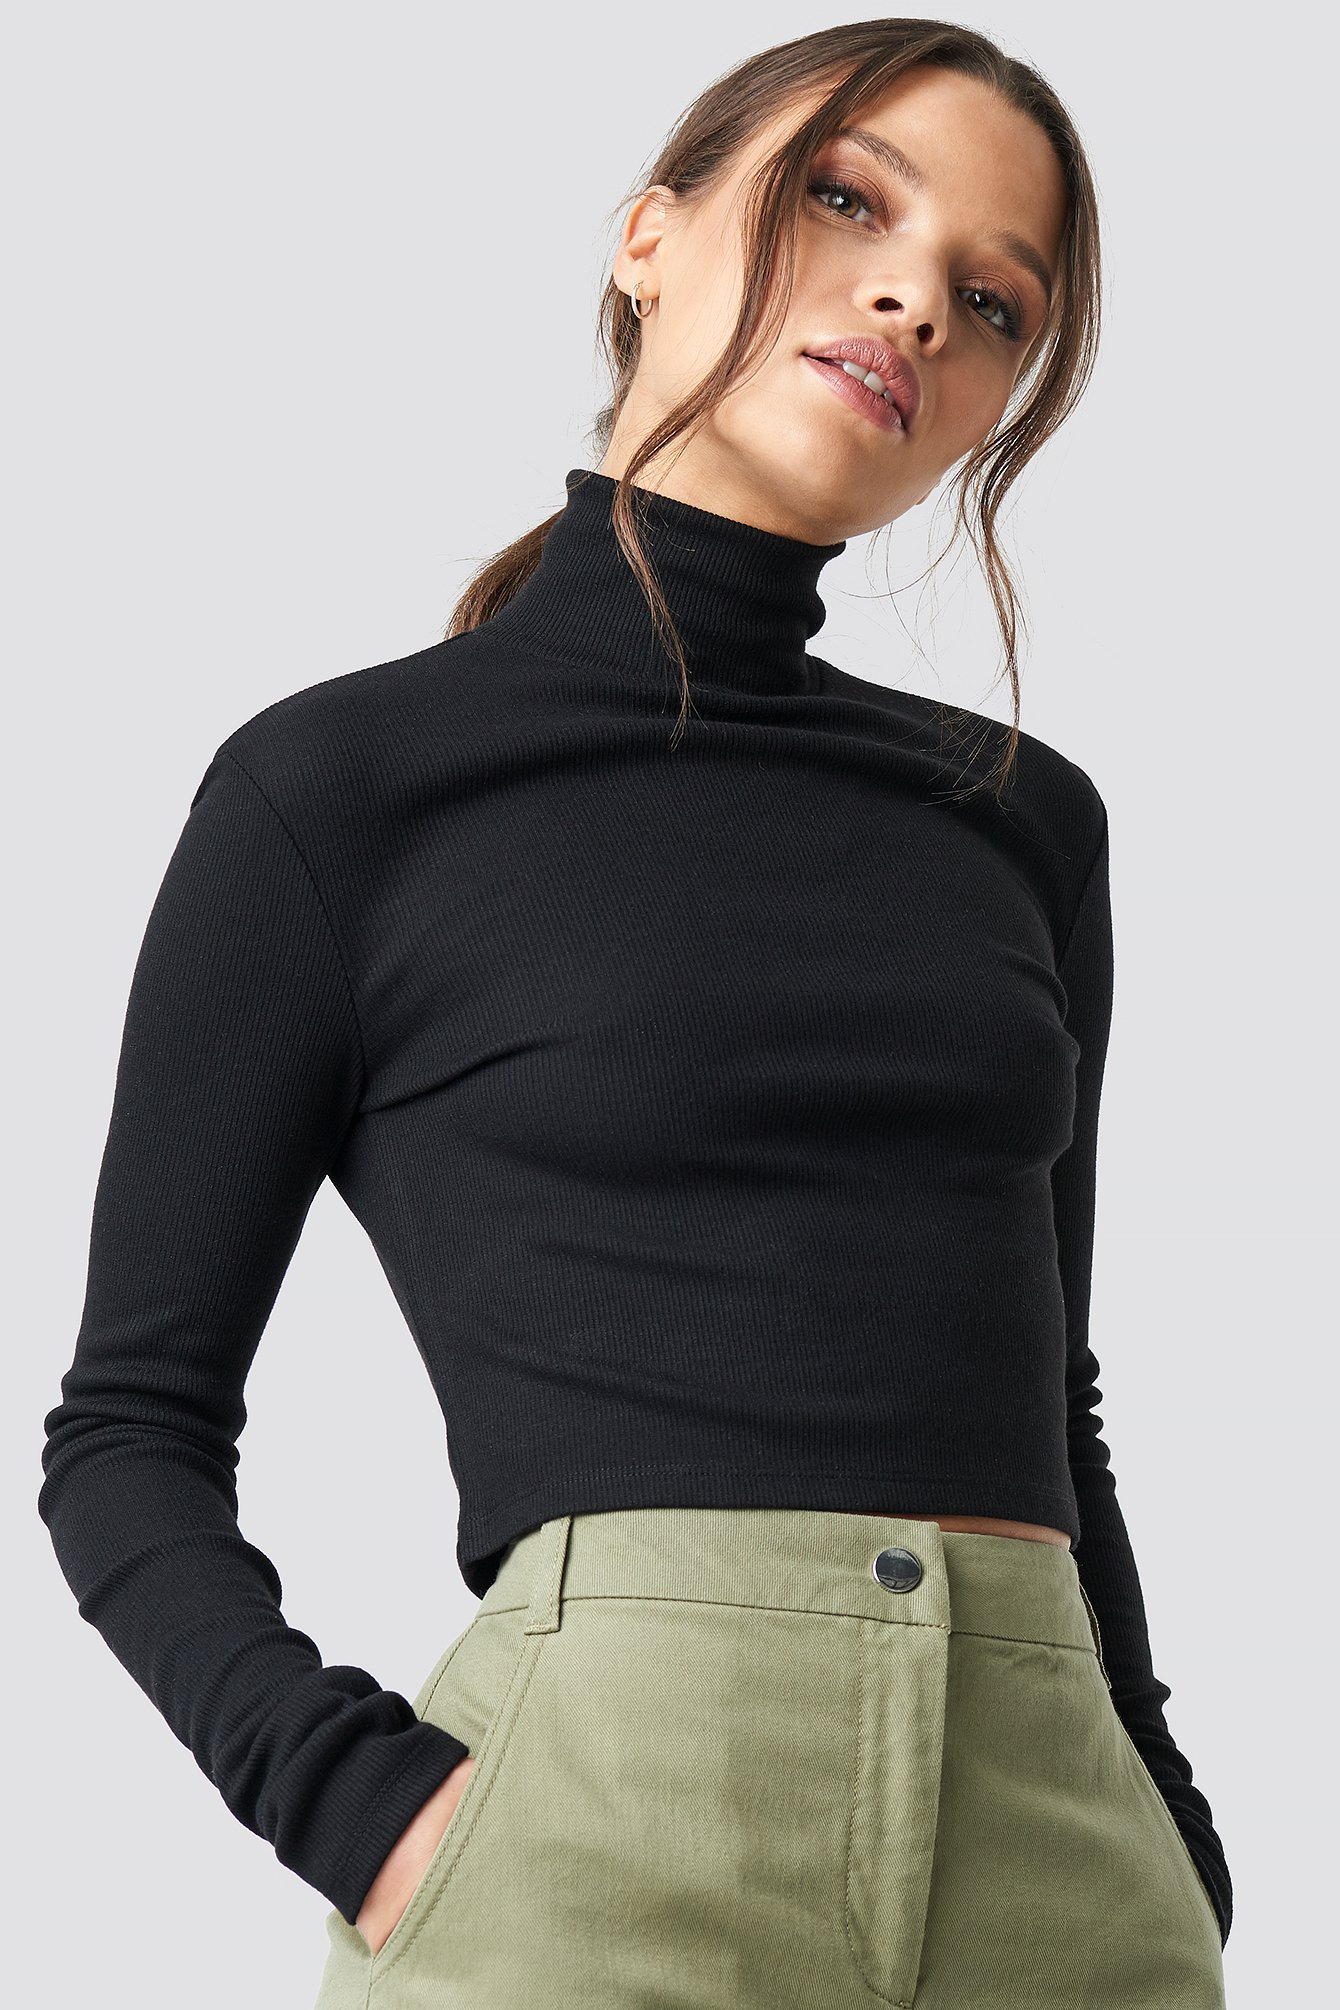 ivana santacruz x na-kd -  Ribbed Turtleneck Crop Top - Black